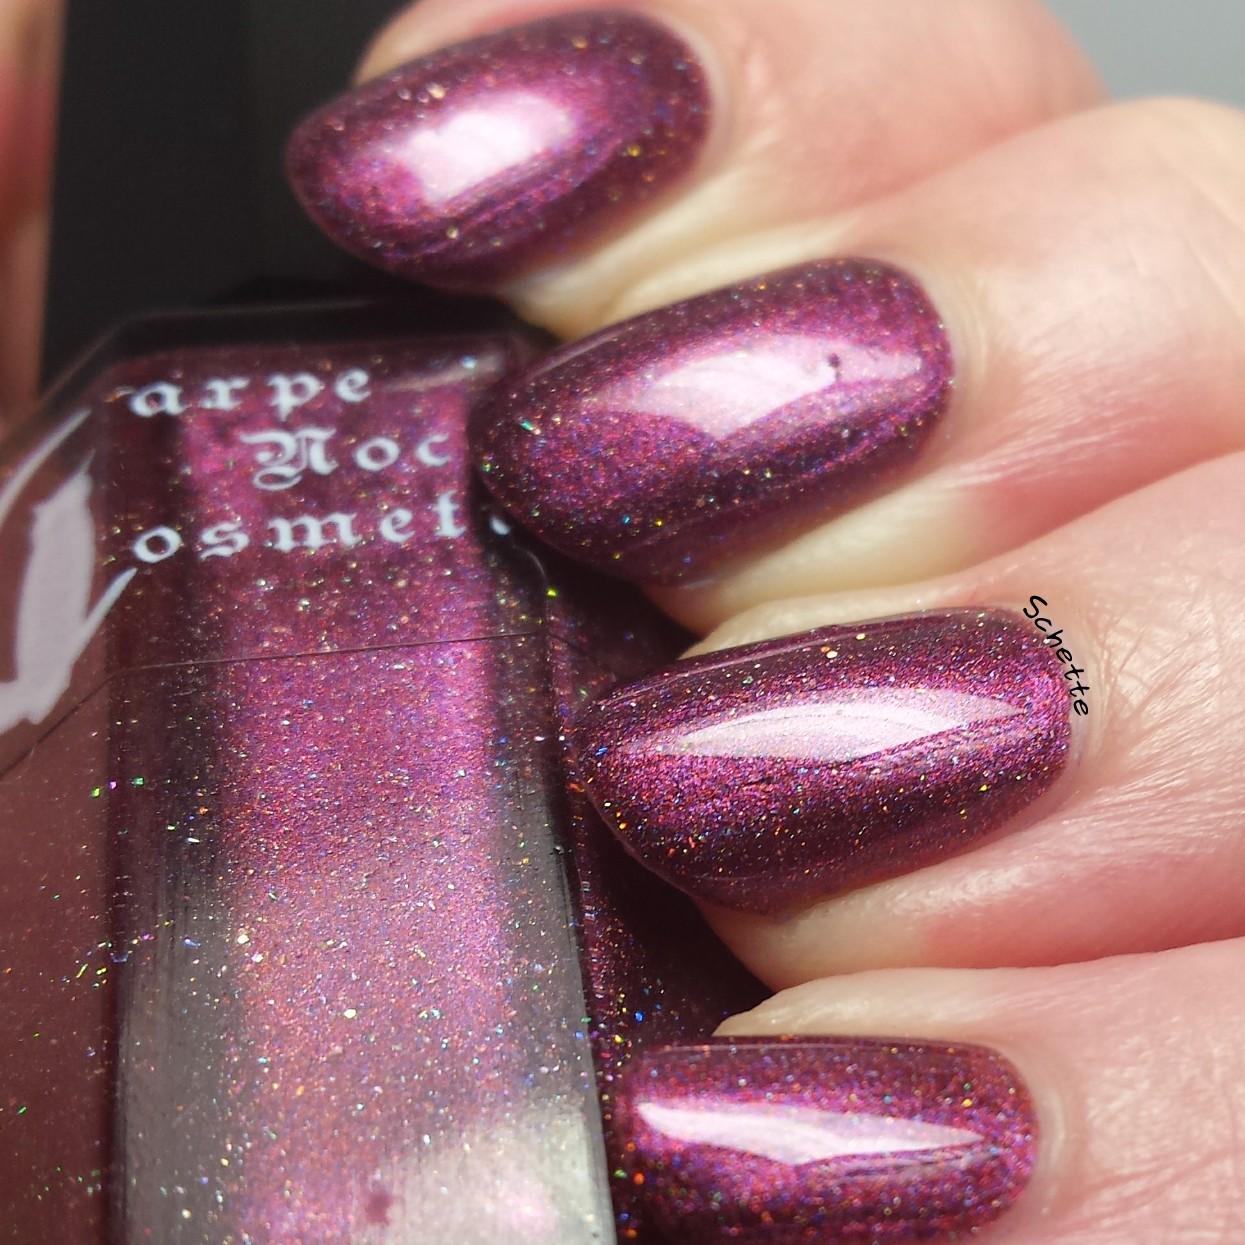 Carpe Noctem Cosmetics : Beauty in her fight